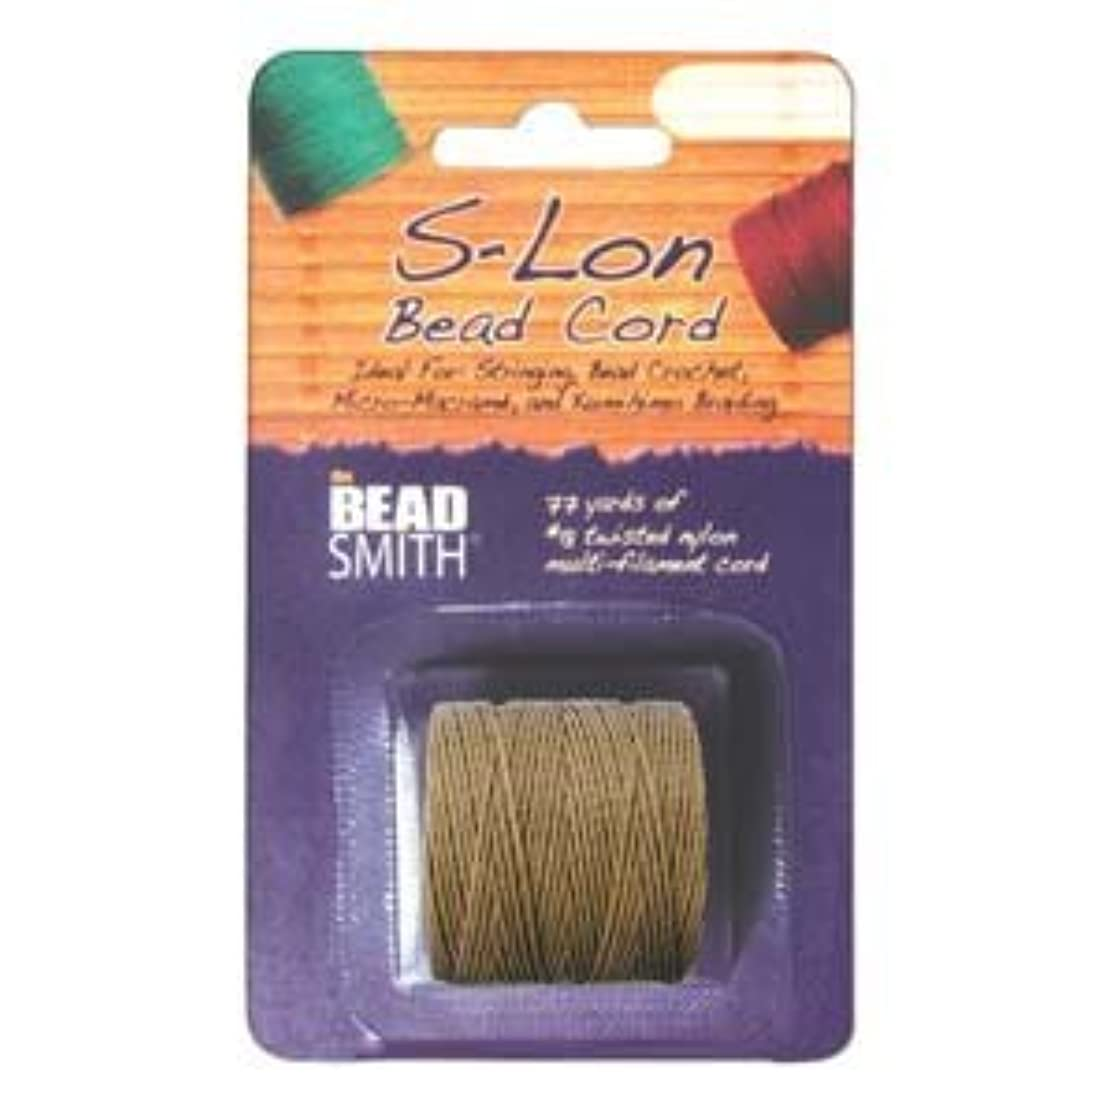 S-Lon Superlon #18 Twisted Nylon Bead Cord 77 Yard Spool Bobbin MEDIUM BROWN